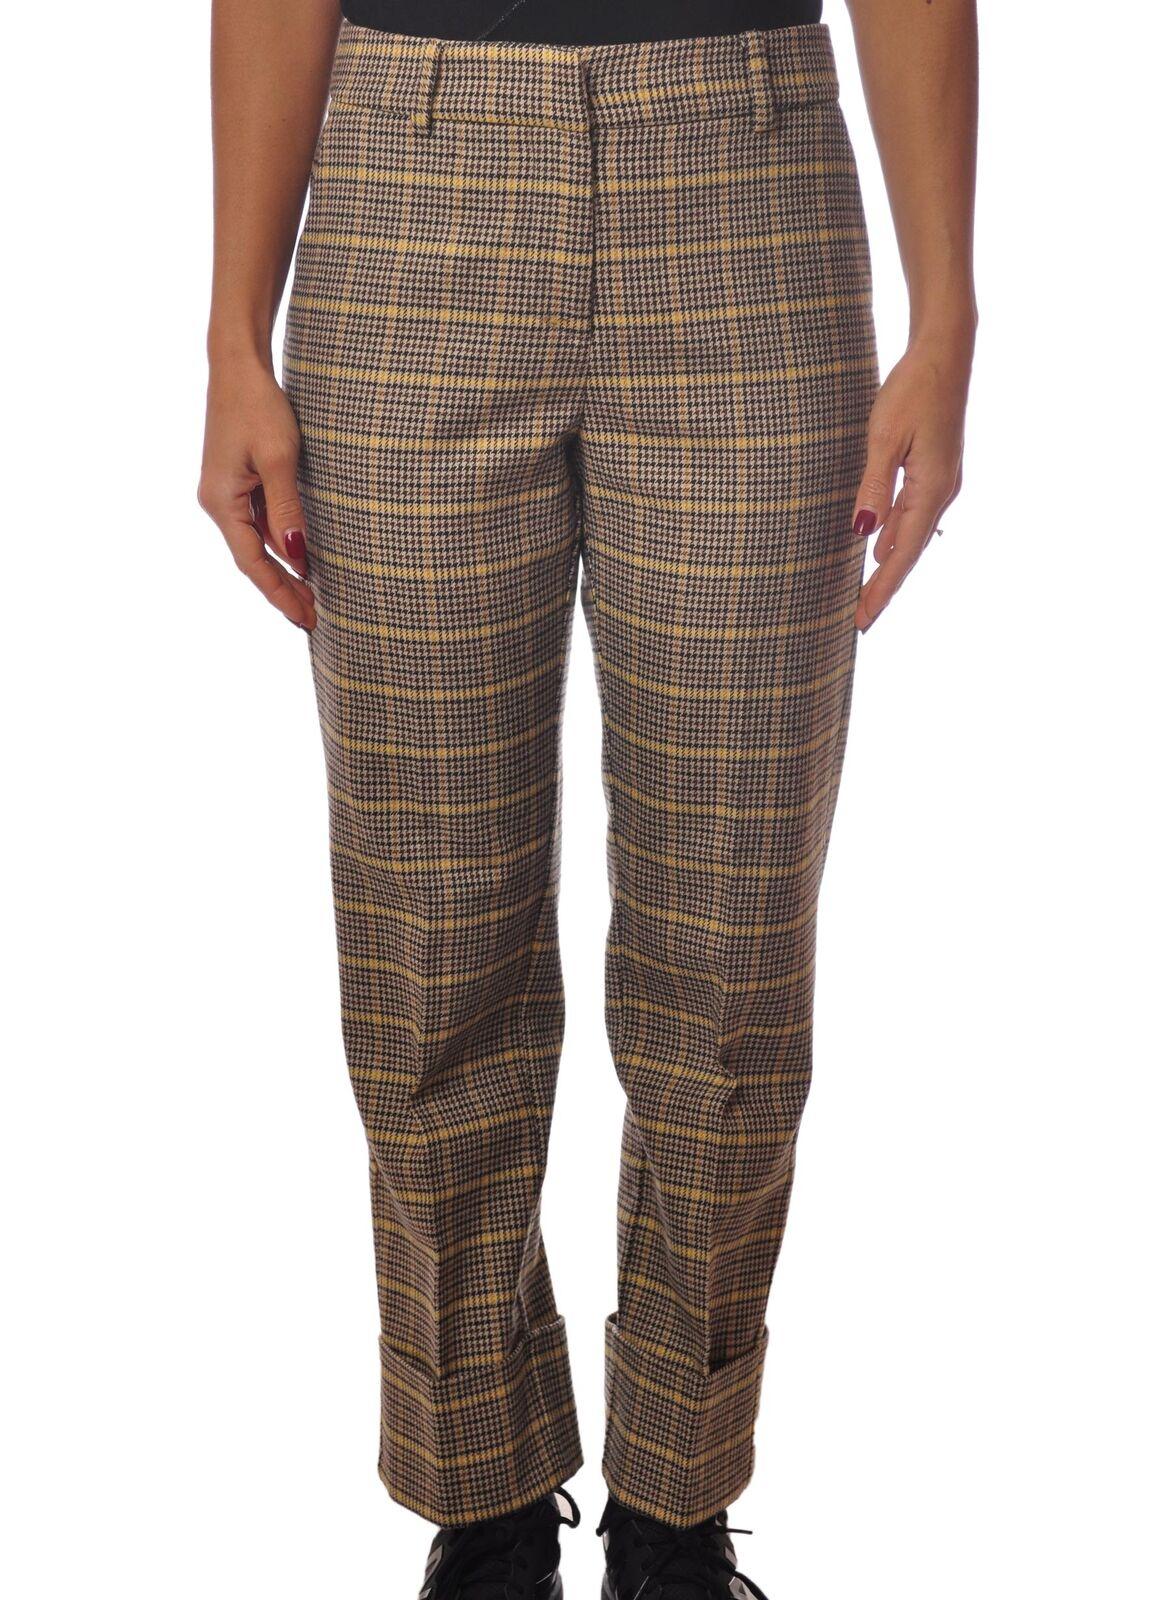 KI 6  -  Jeans  Pantalons - Femelle - Fantasy - 4551523A184811  ventas en linea